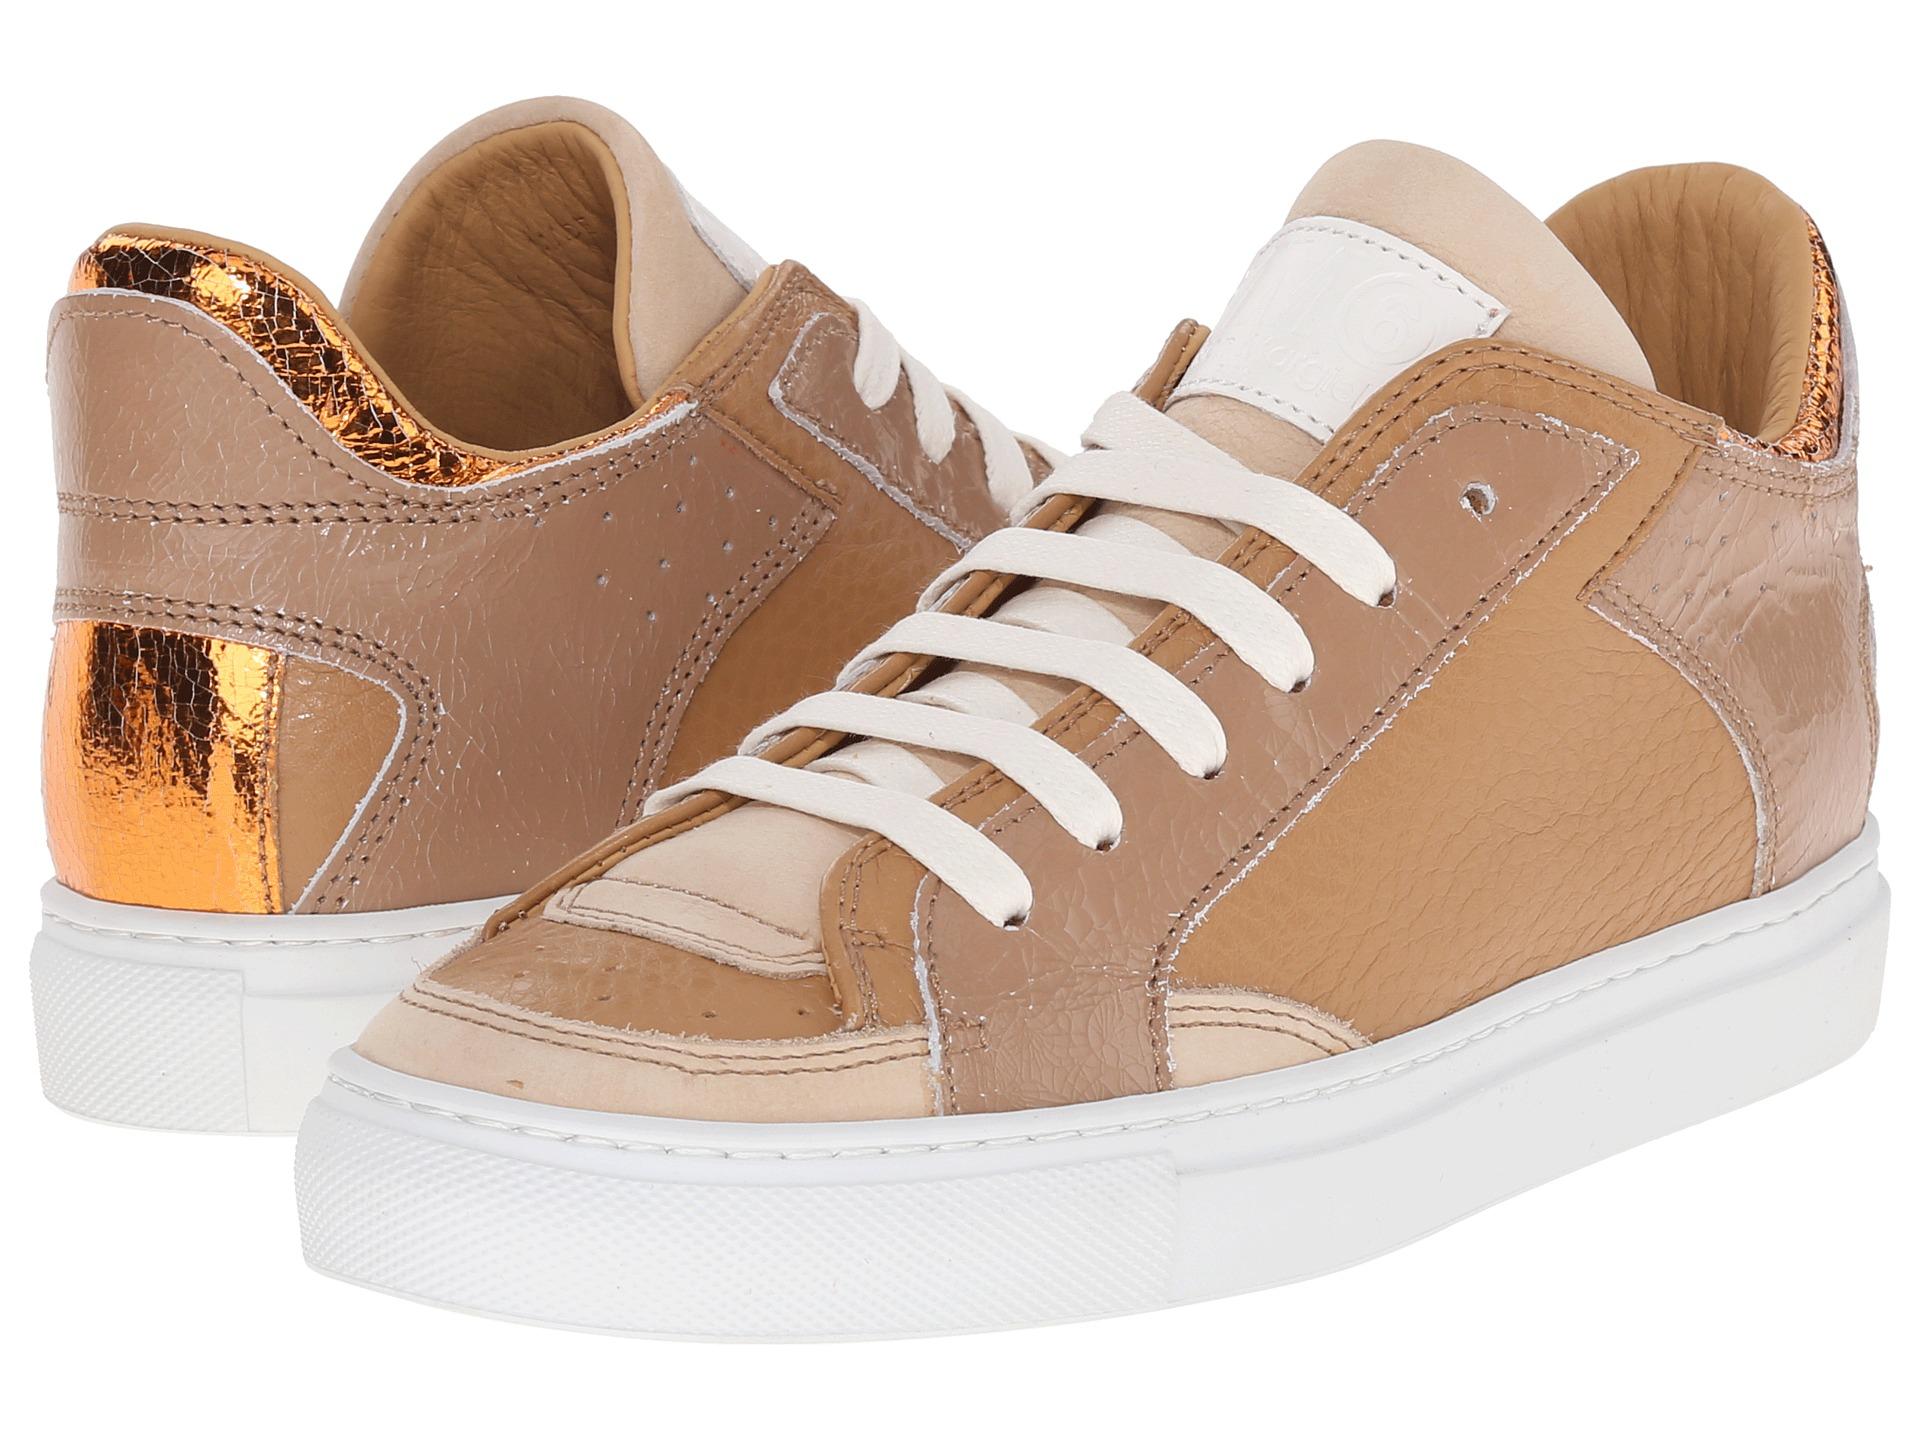 MM6 Maison MargielaMetallic Crackle Low Top Sneaker syG4Smml